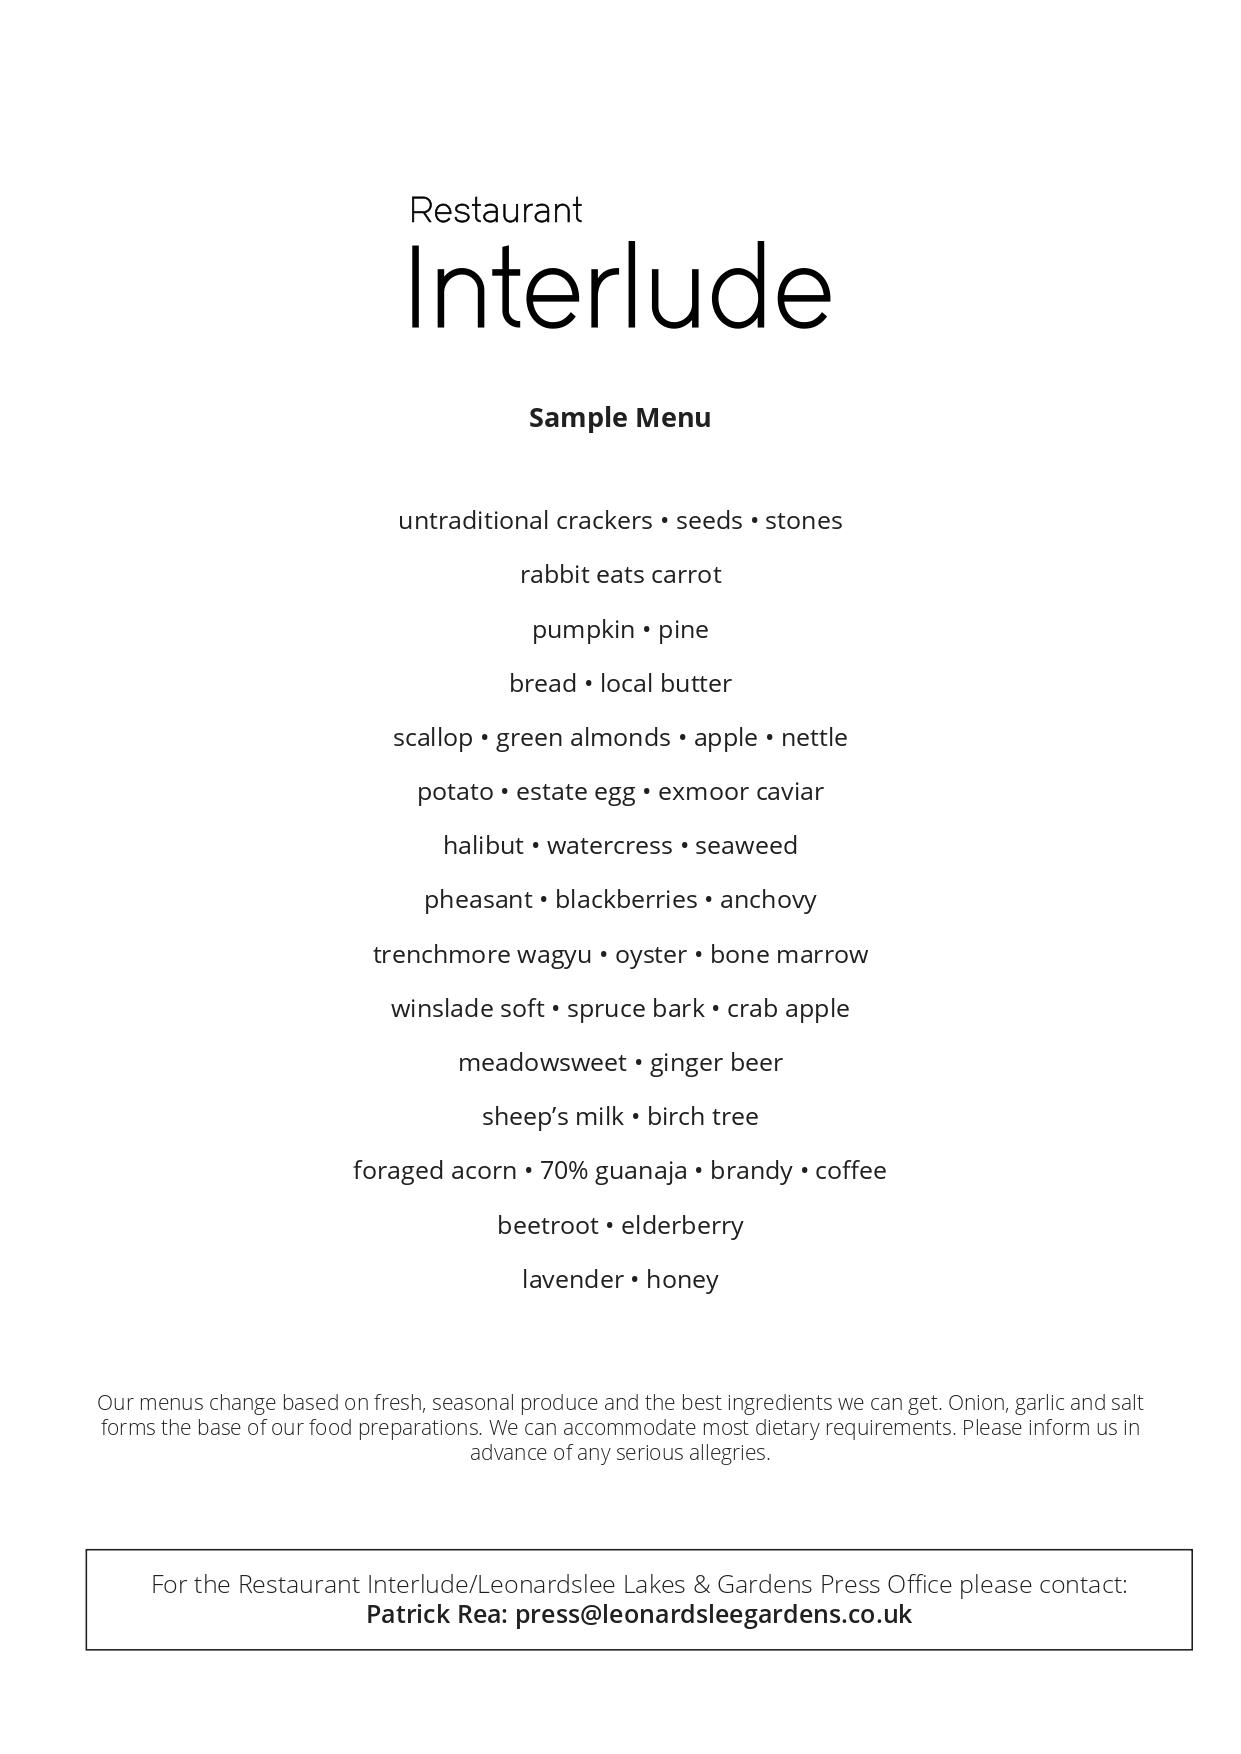 Restaurant.Interlude.Sample.Menu.-.16.Aug (1)_page-0001.jpg